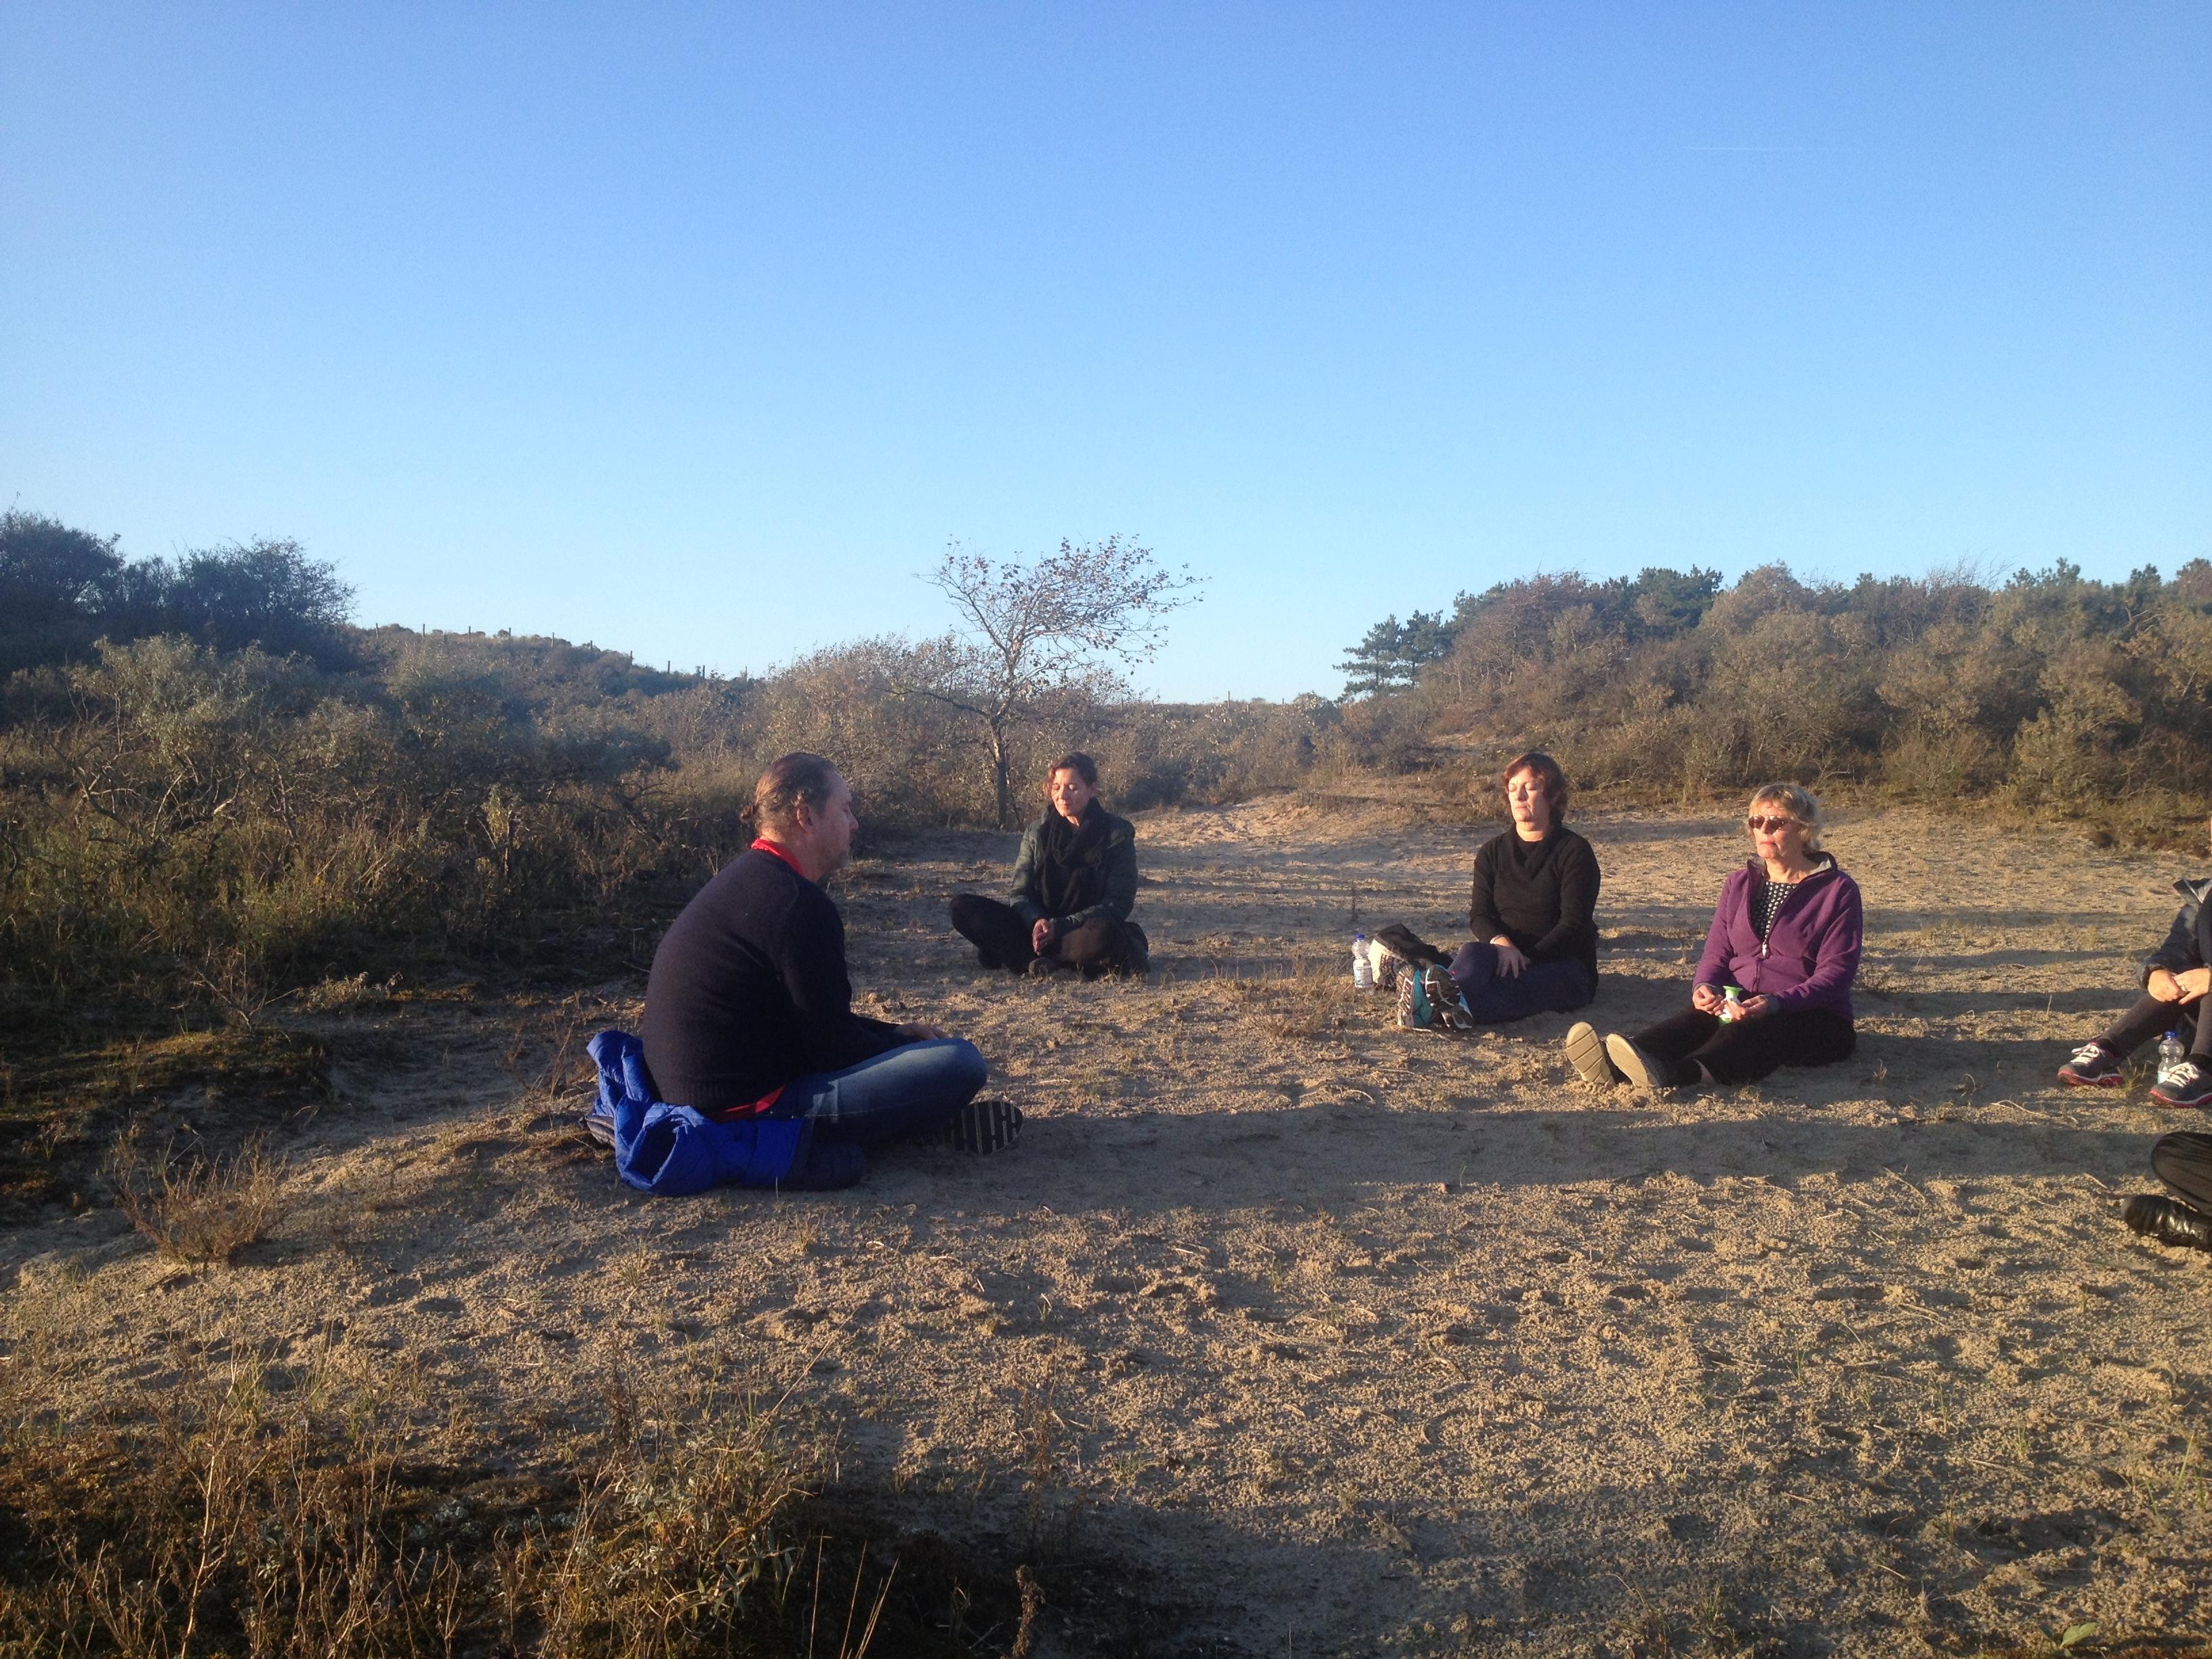 Yoga en Mindfulness Retraite in Wassenaar Oktober 2016